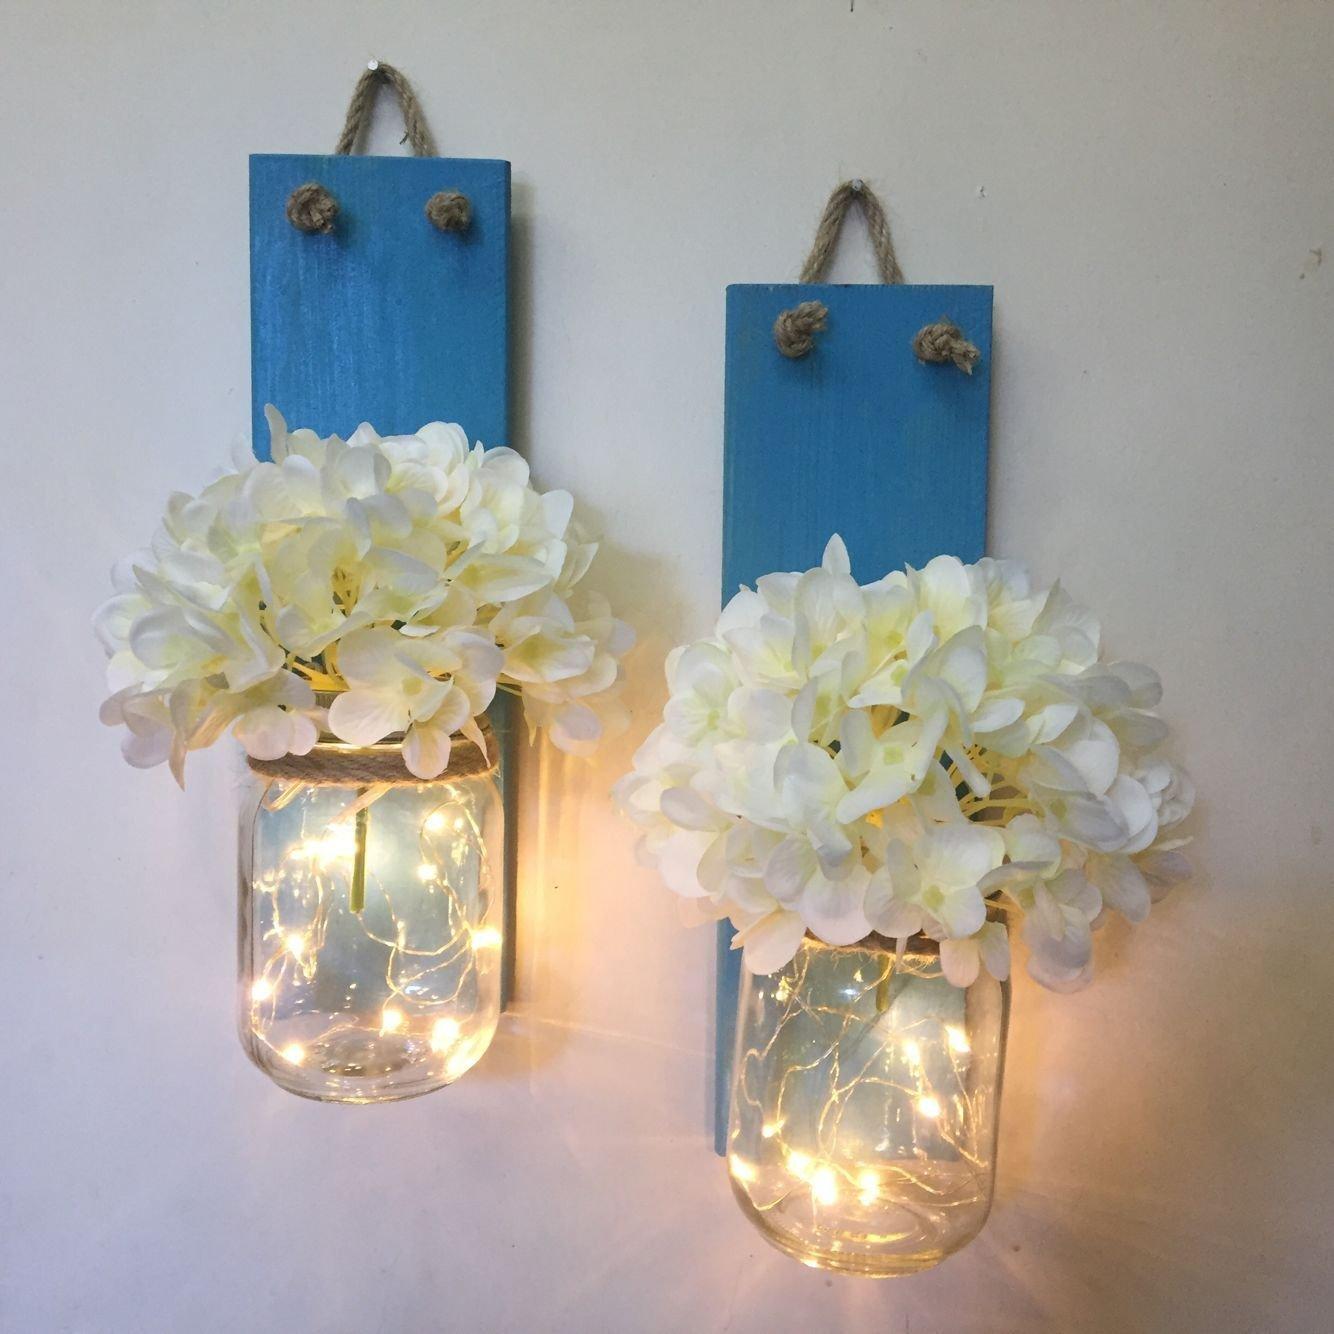 Mason Jar Hanging Wall Sconces Rustic Home & Living Decor, Rustic Wedding Decor, Lighted Mason Jar, Country Decor Hanging Wall Vase Shabby Chic